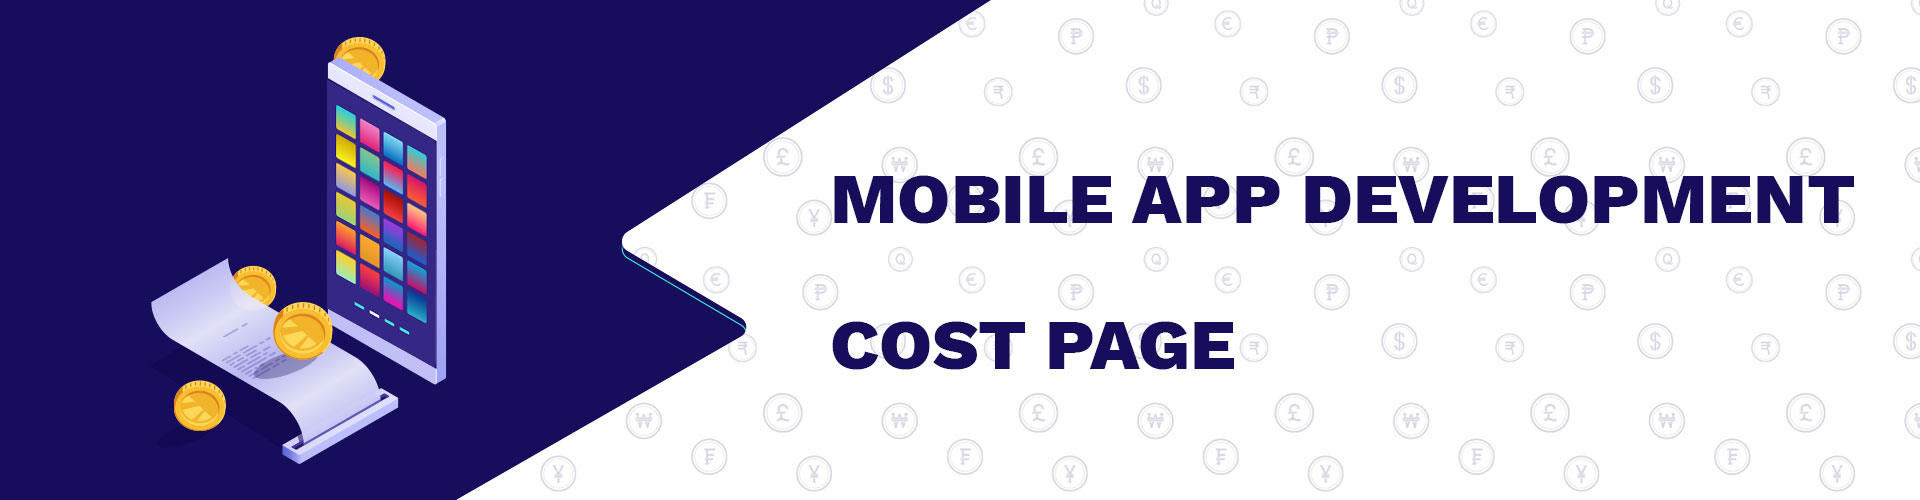 app development cost 2019